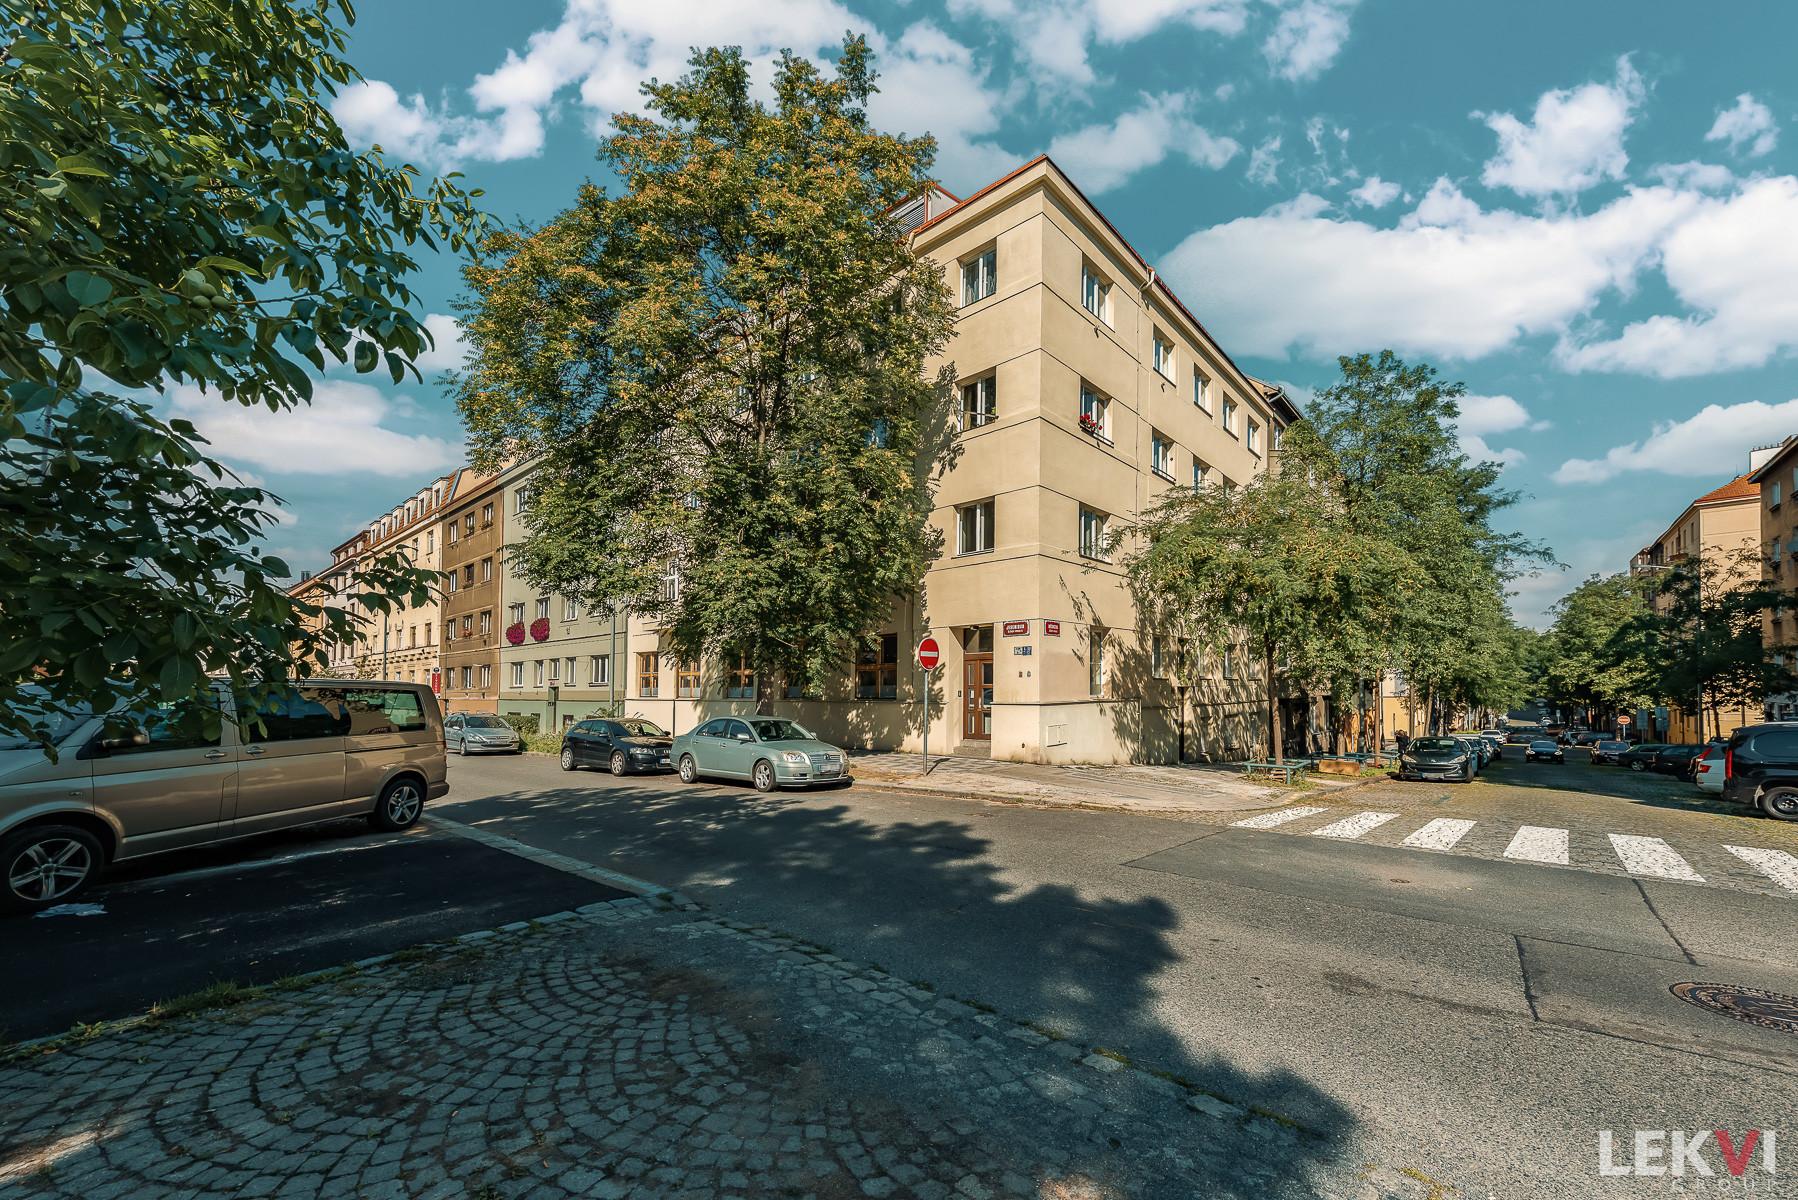 Prodej bytu 2+kk, 50 m2 - Hájkova, Praha 3